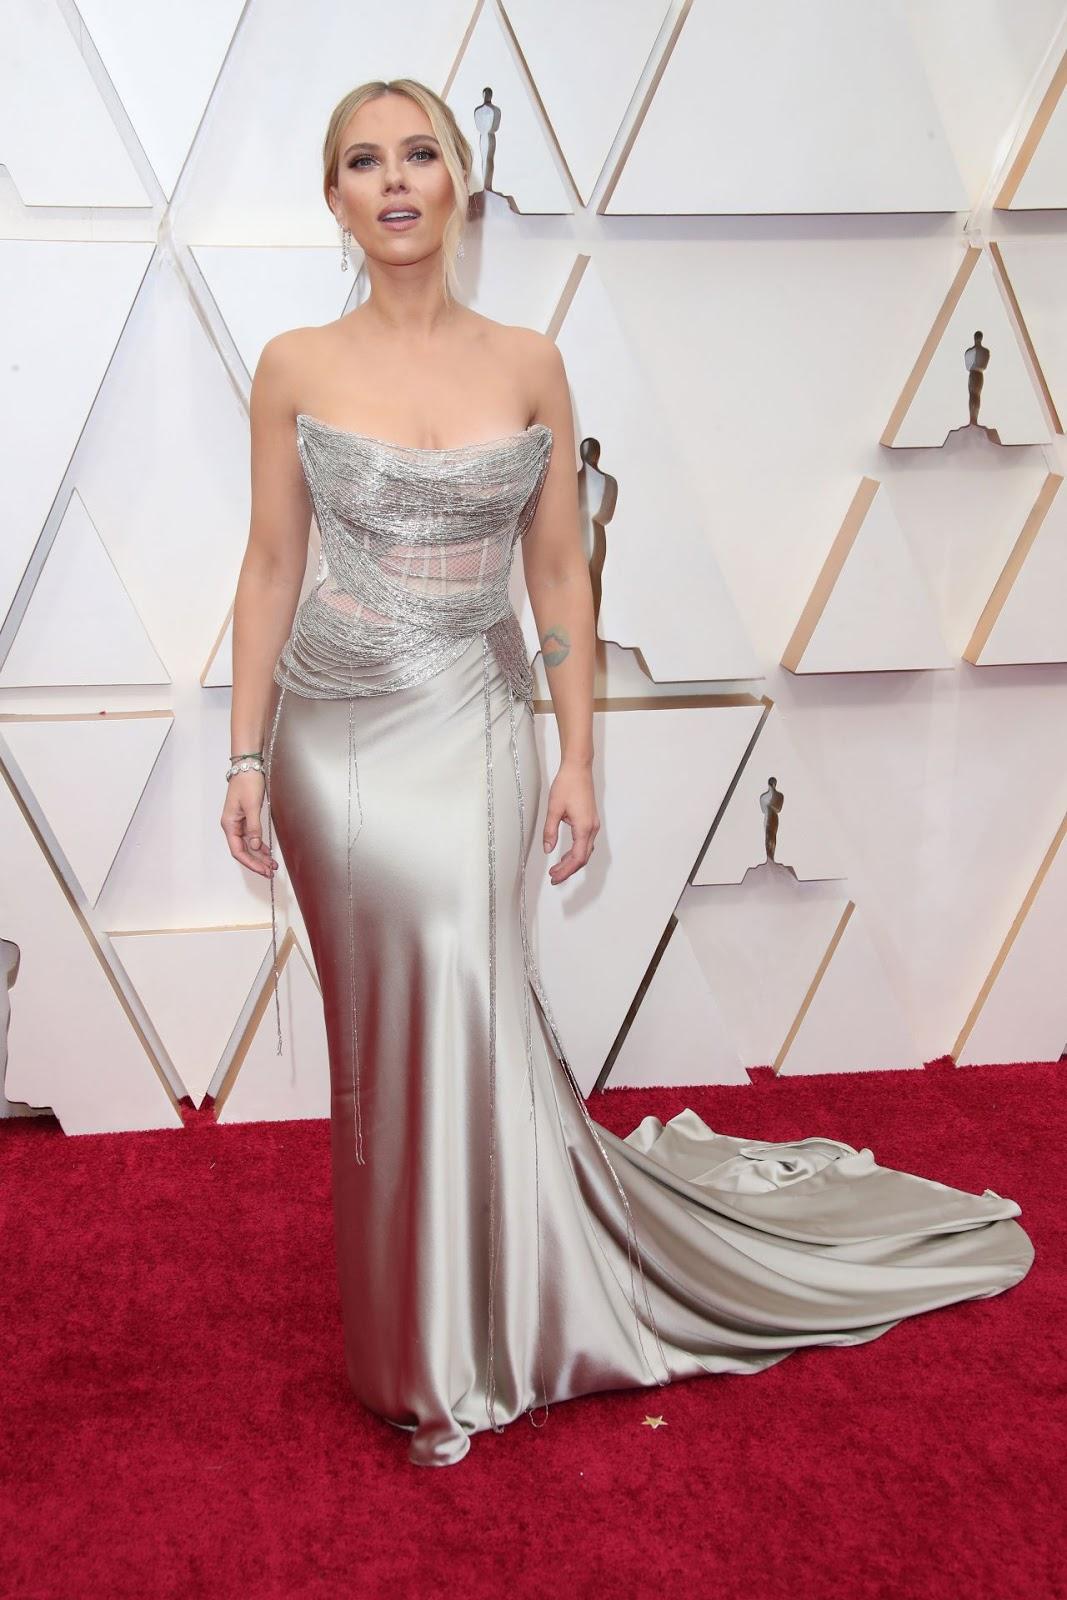 Scarlett Johansson Reinvents Fishnet in Daring 2020 Oscars Gown